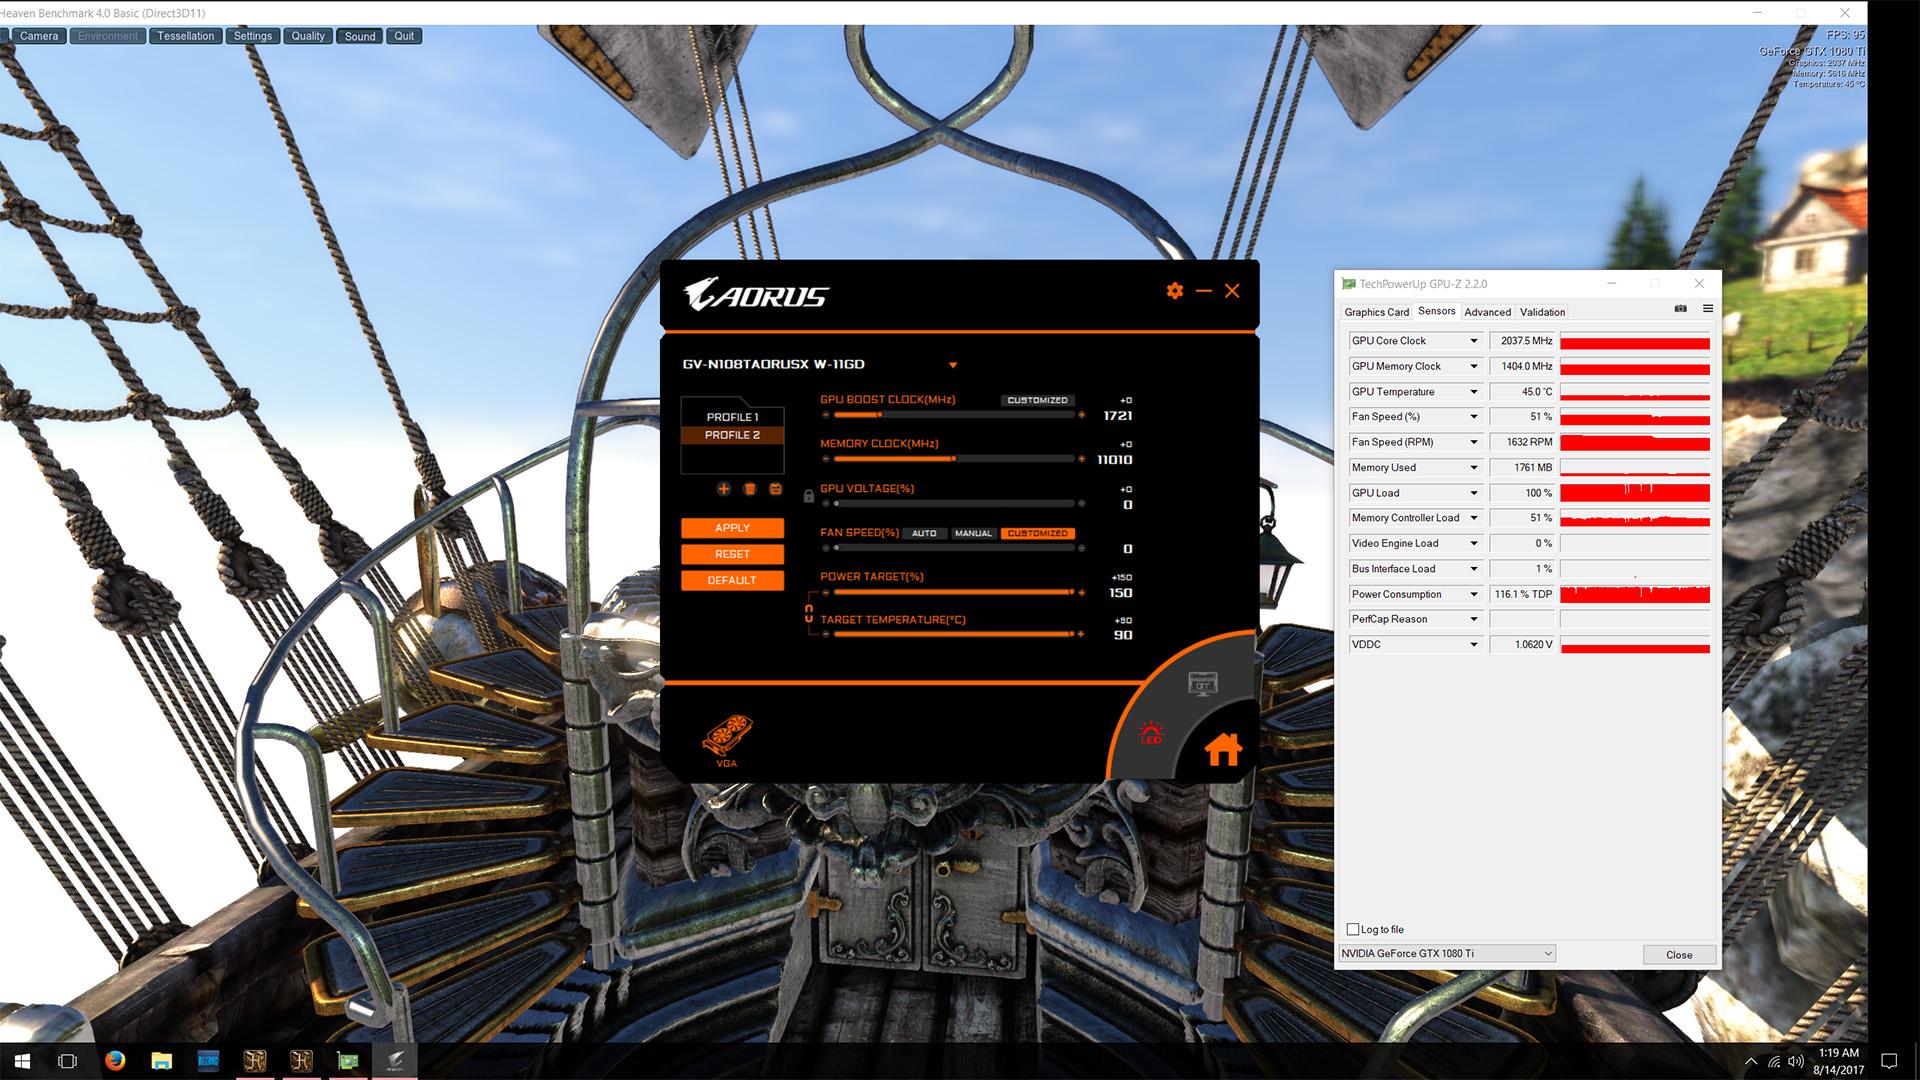 Review: AORUS GTX 1080 Ti Waterforce Xtreme Edition 11G - XG